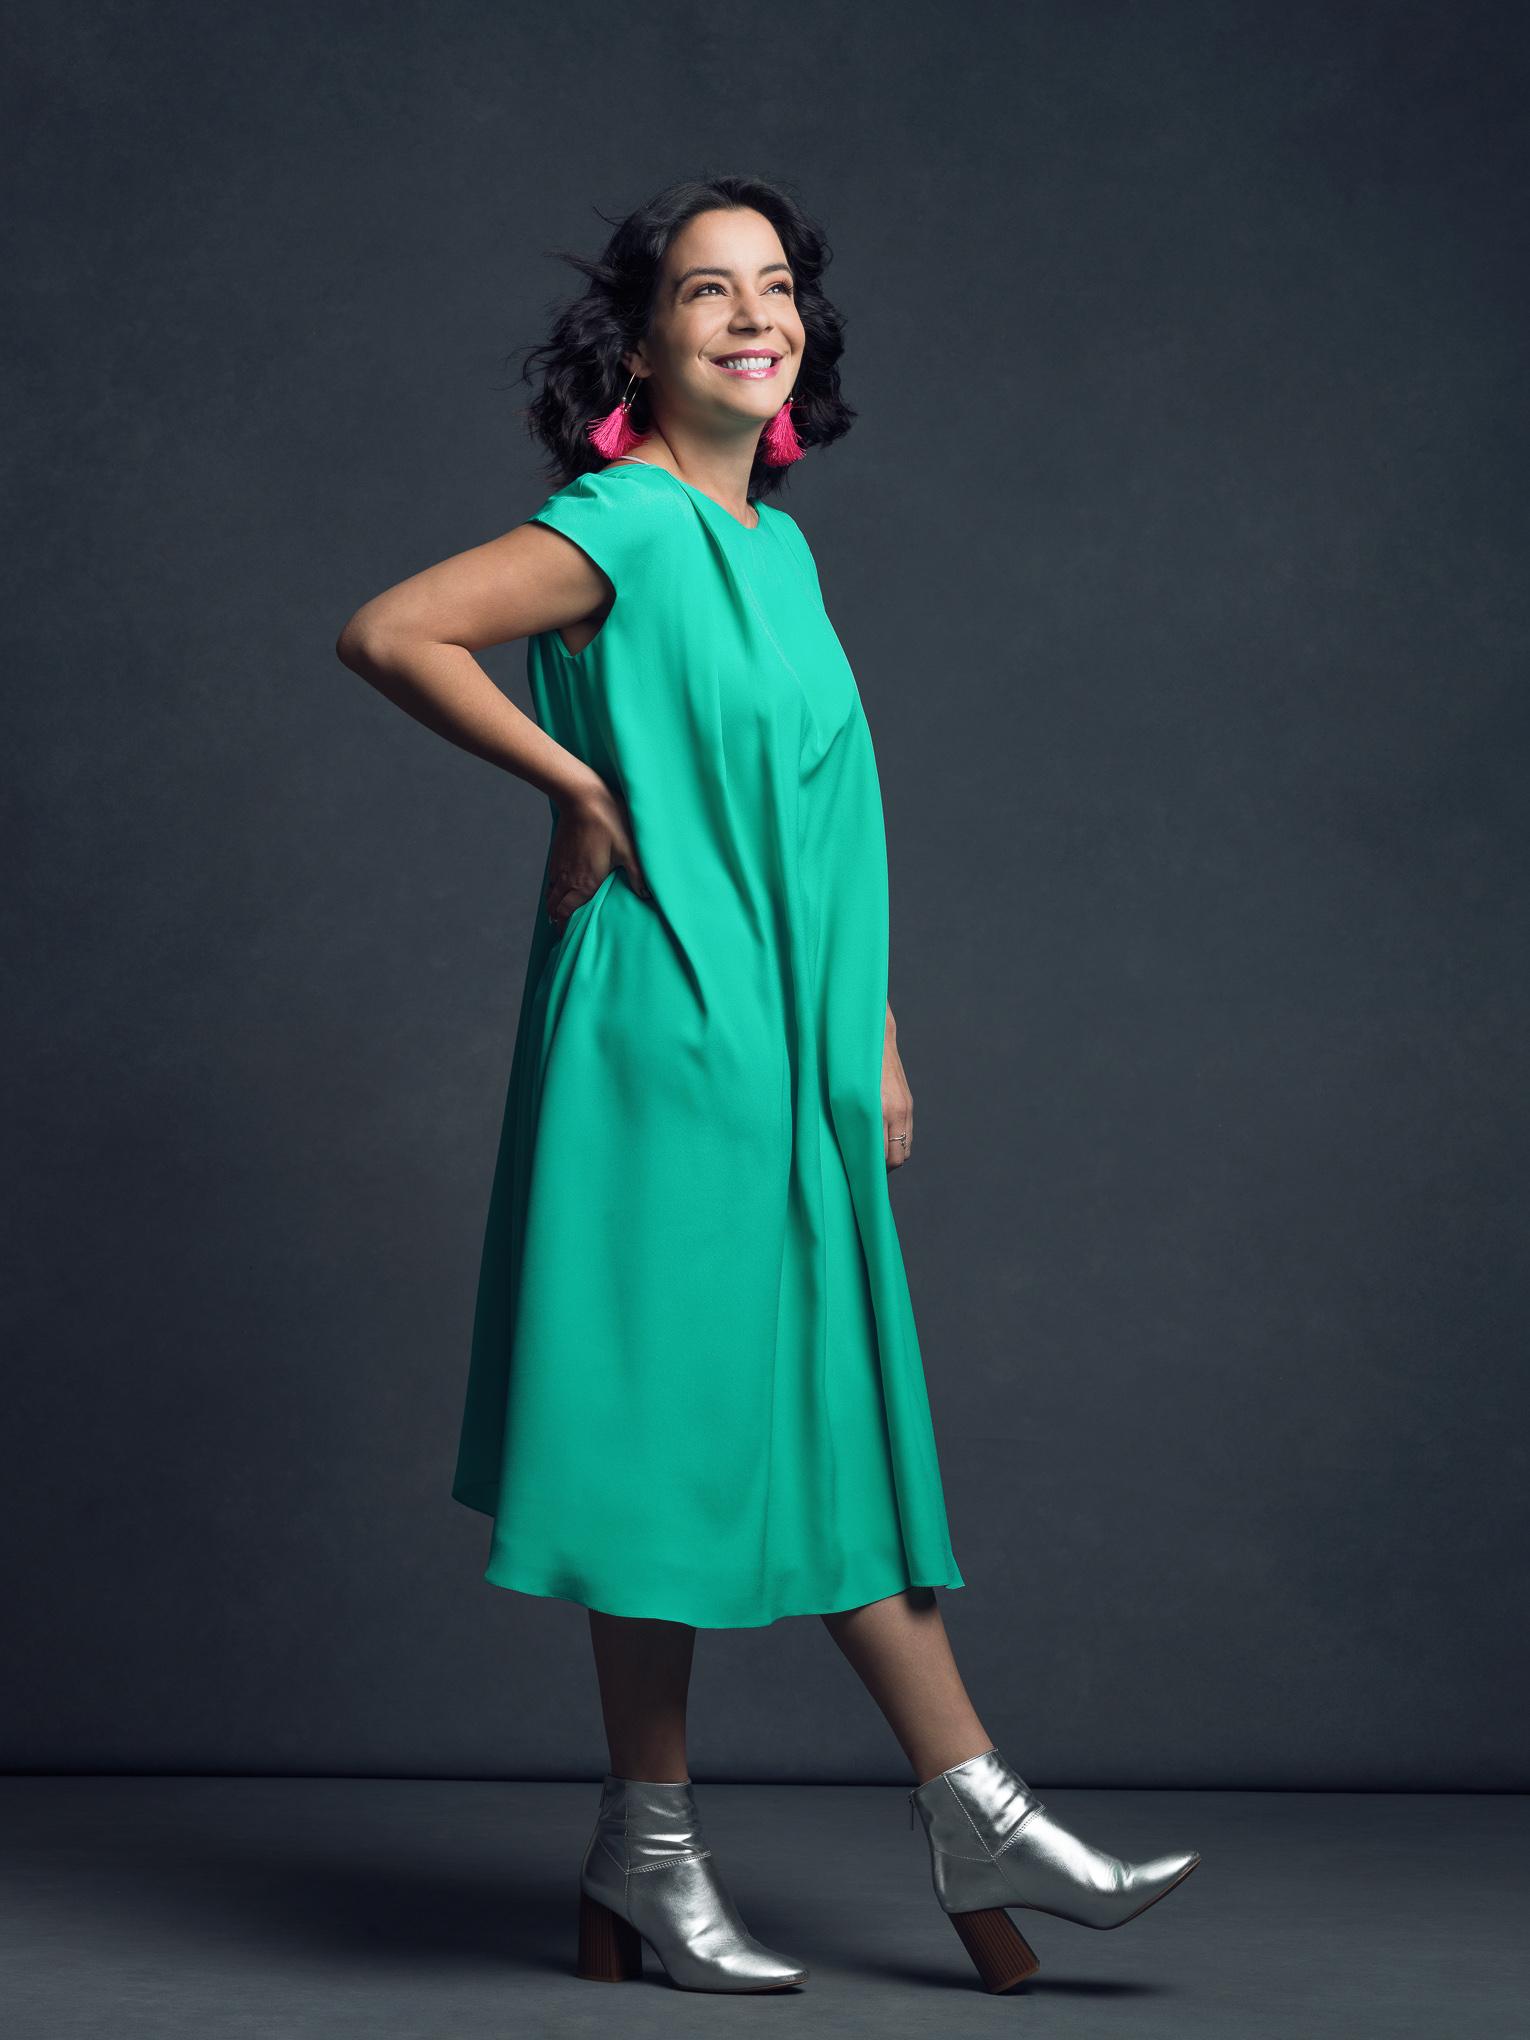 The Optimist Storyteller - Luchi Cosenza in the Nigella Dress